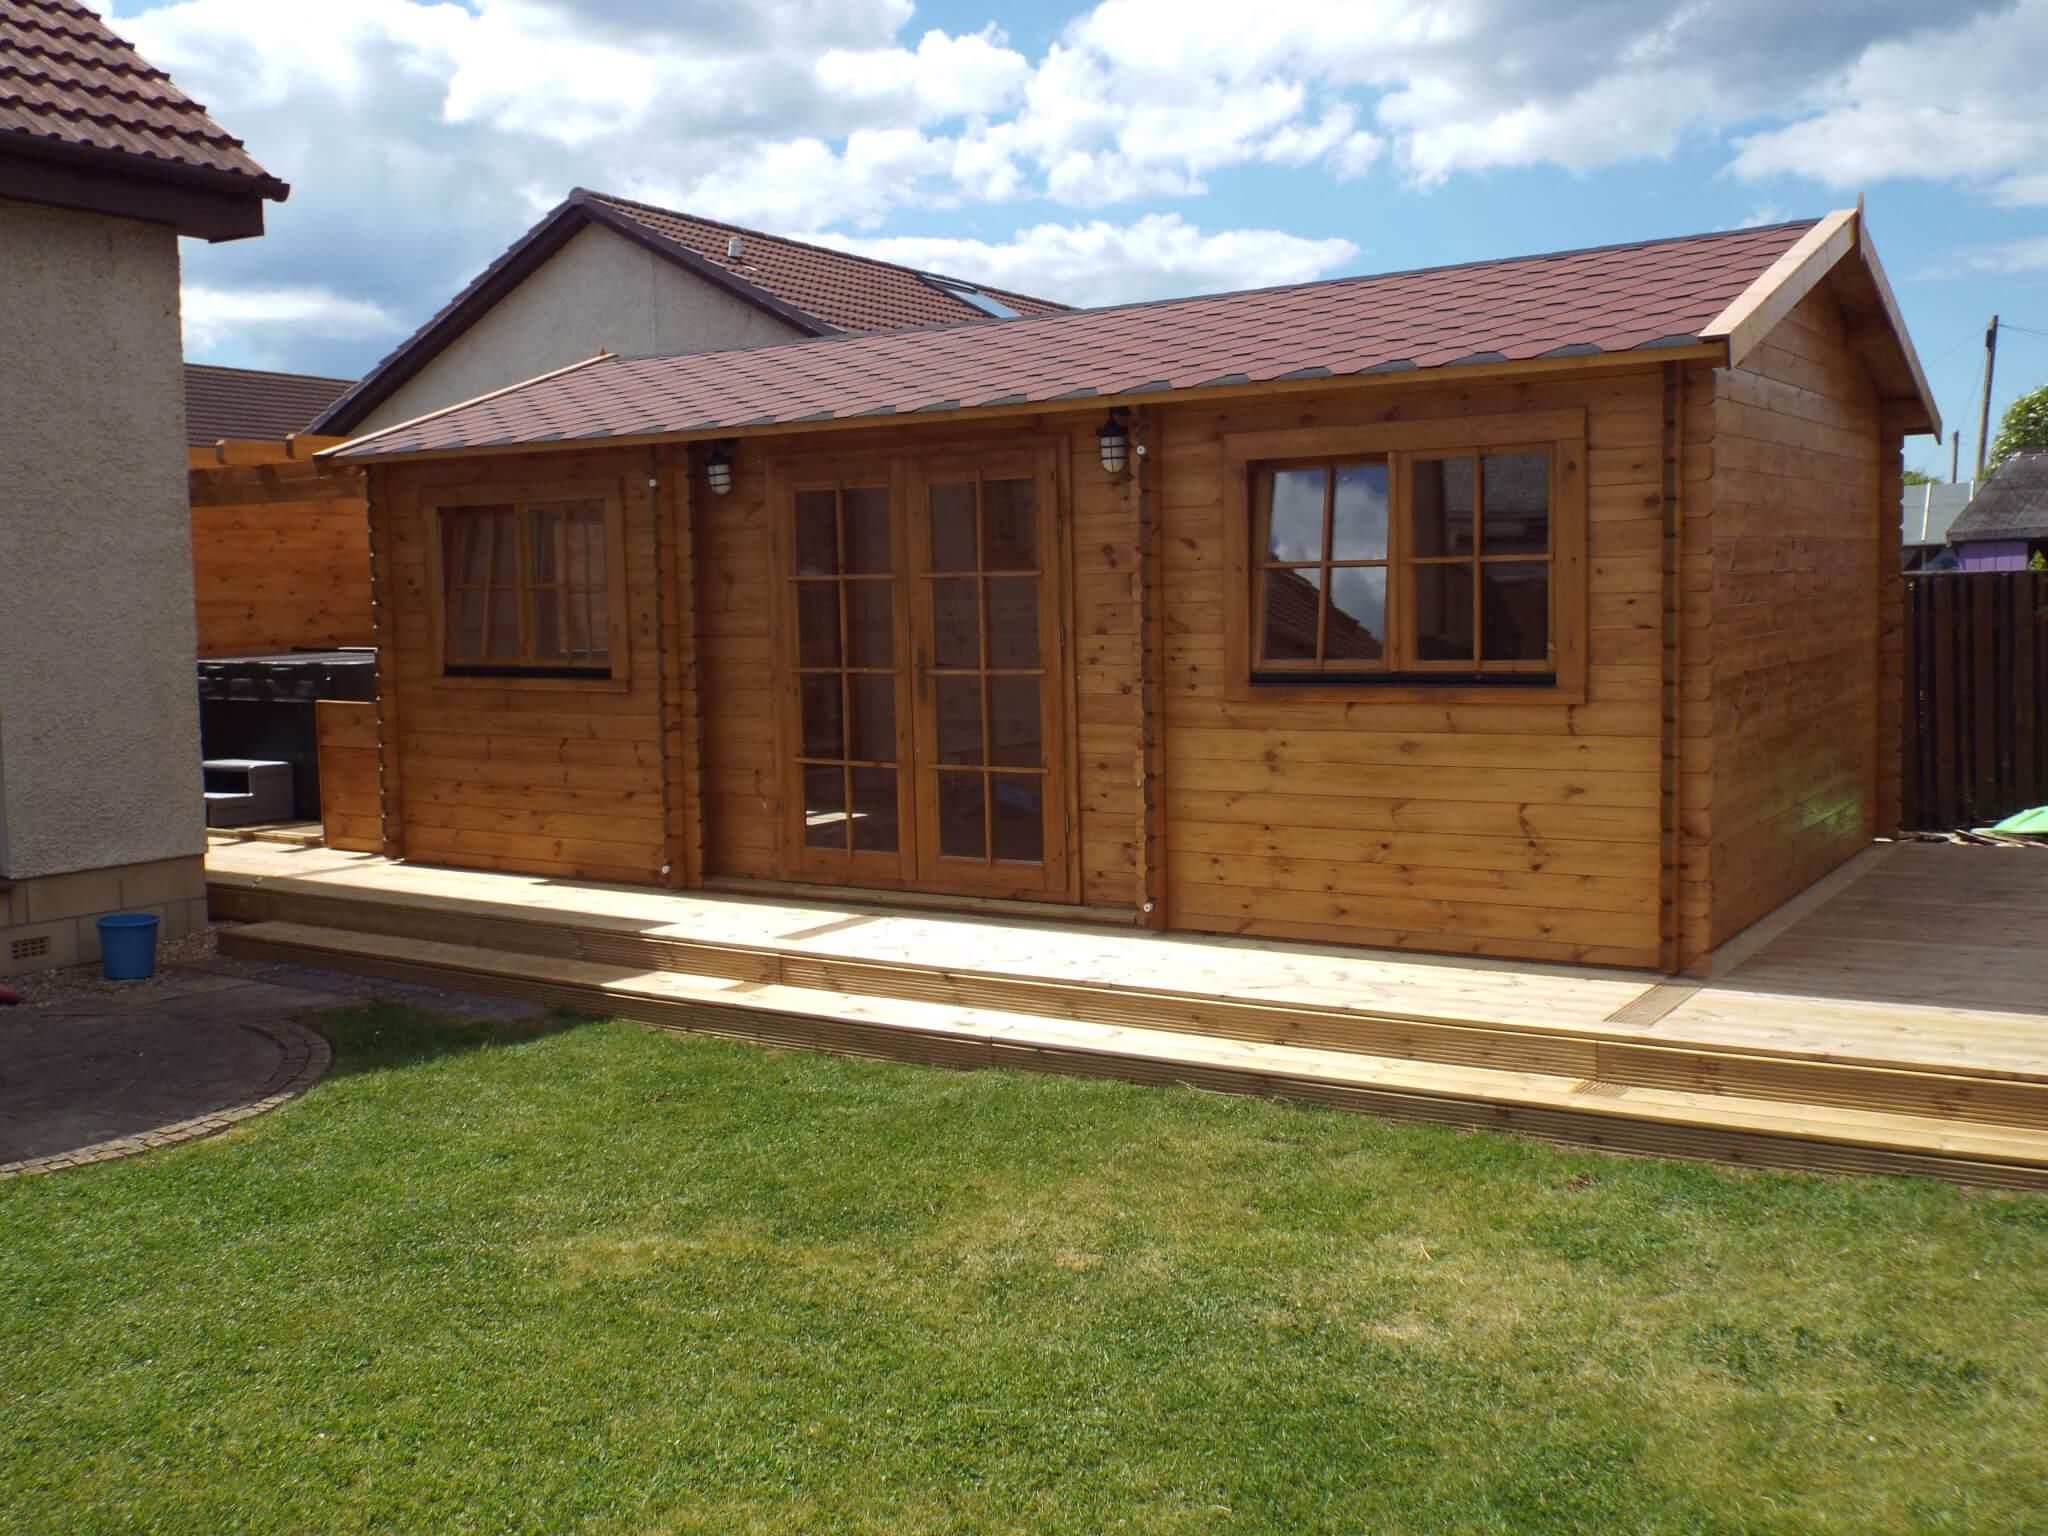 Log cabin gym hot tub prestwick caldera spas scotland for Cottages with sauna and hot tub